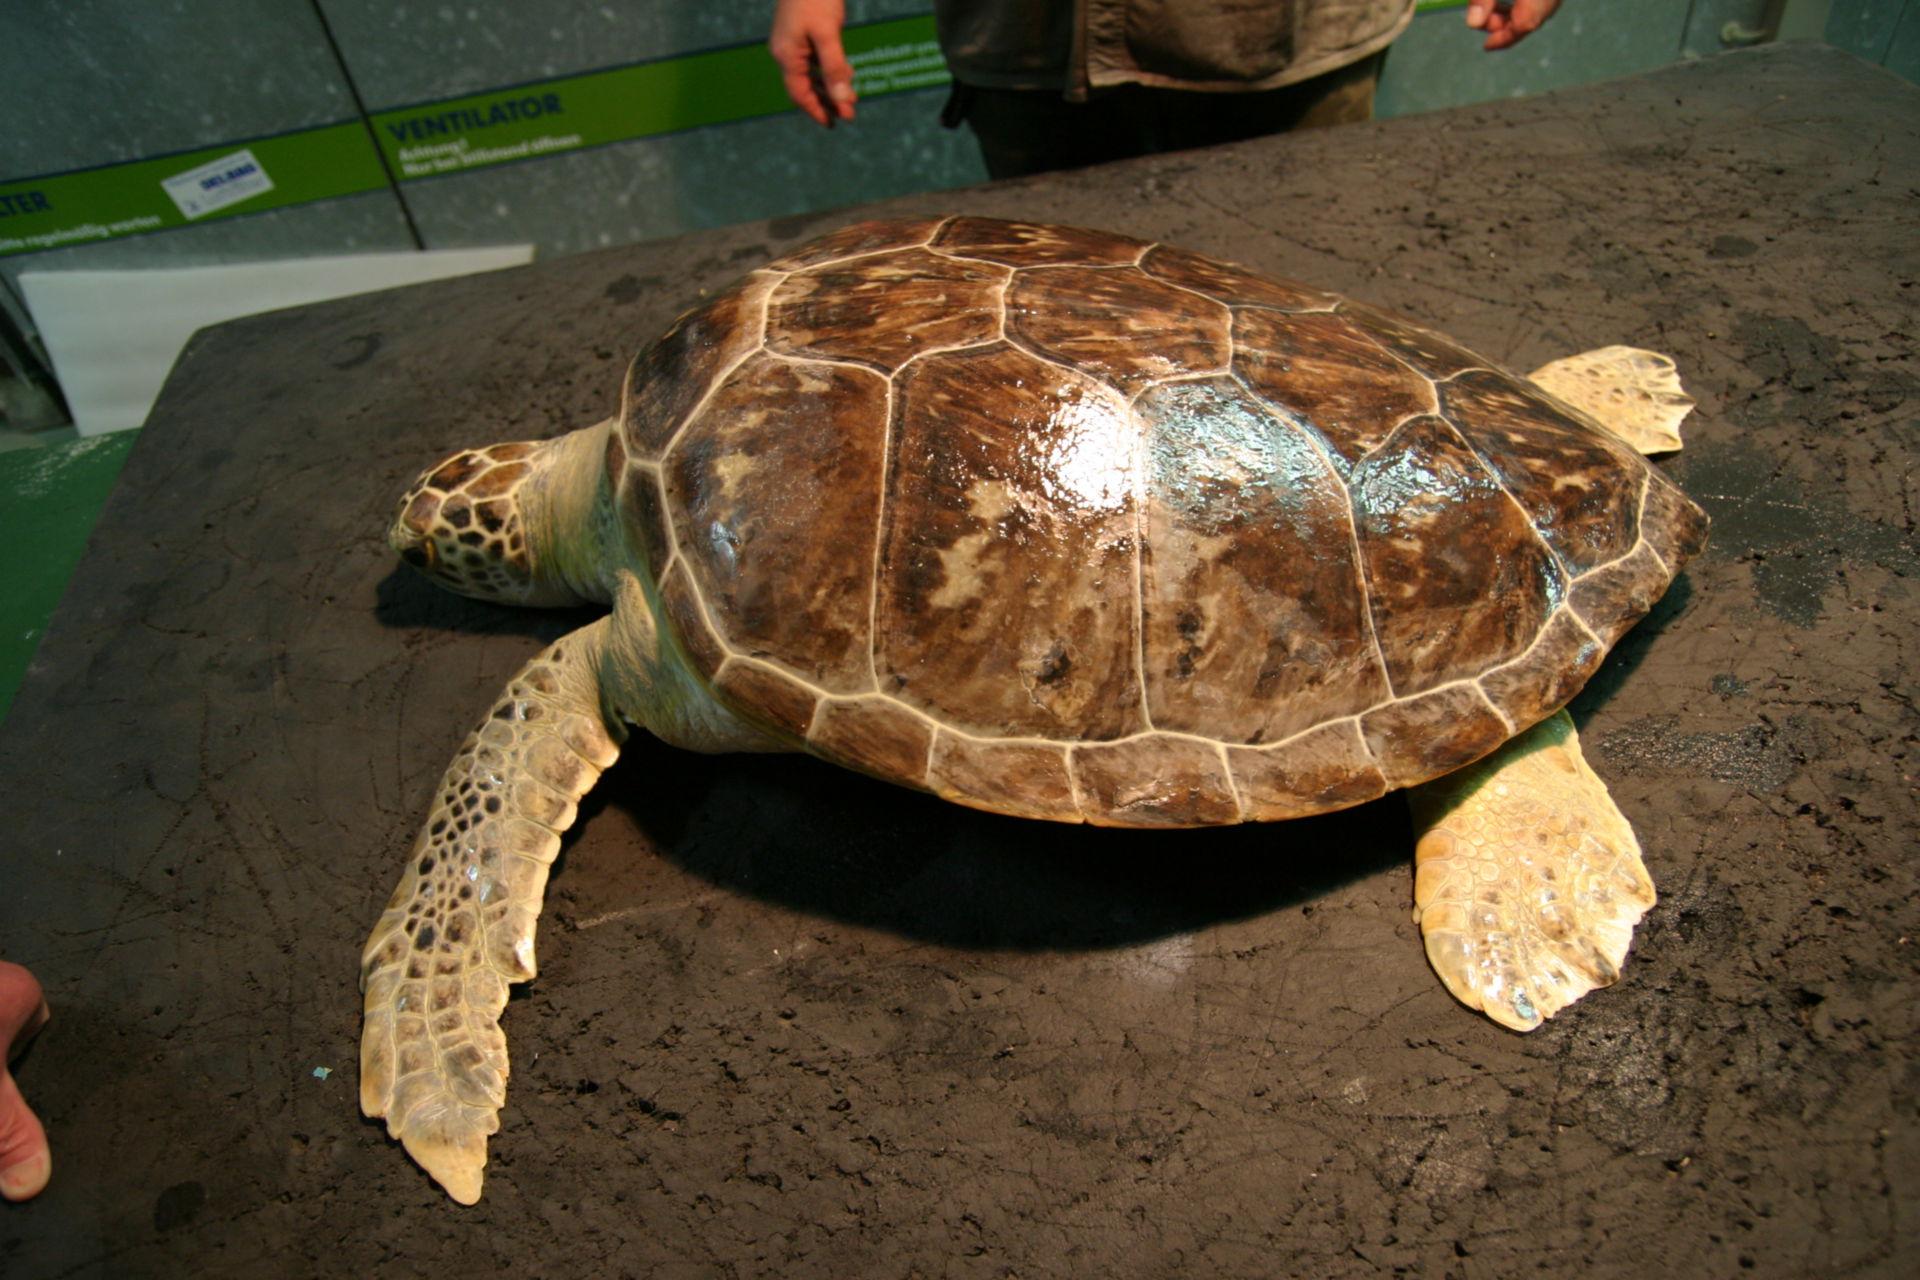 Veterinary Medicine: Chelonia Mydas Turtle, Gdynia Poland